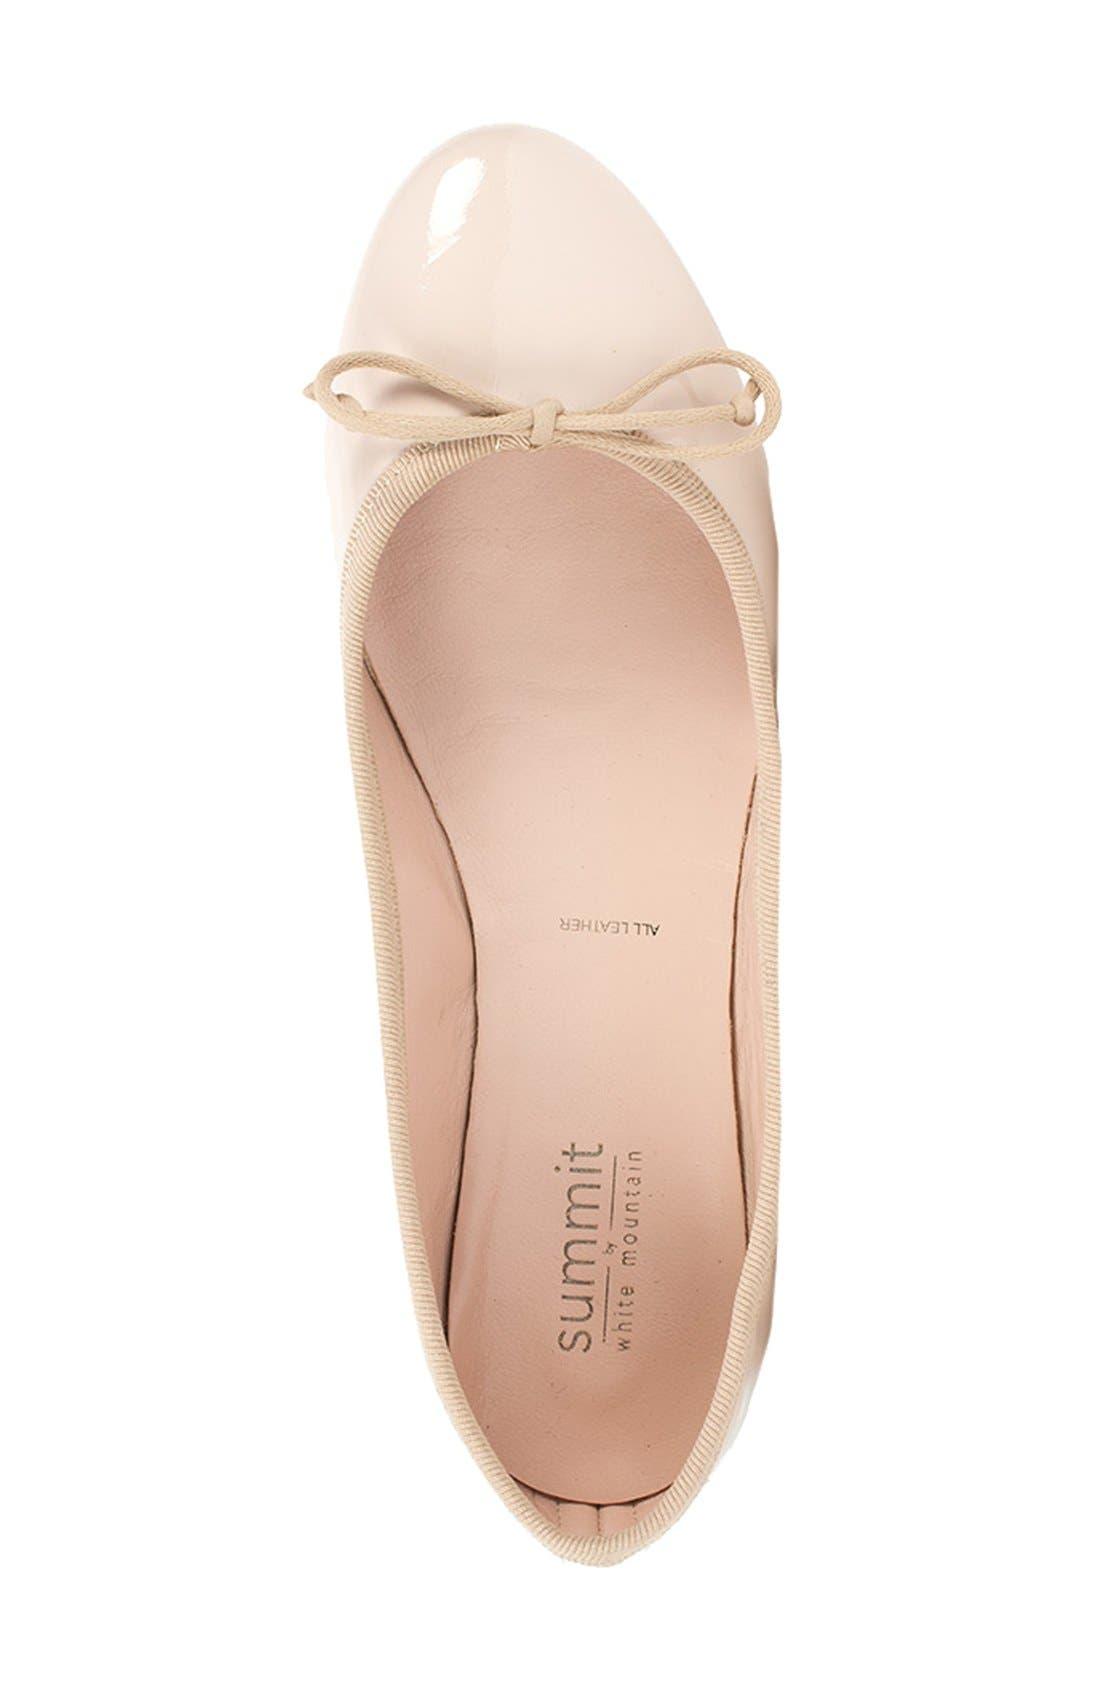 Summit 'Kendall' Ballet Flat,                             Alternate thumbnail 27, color,